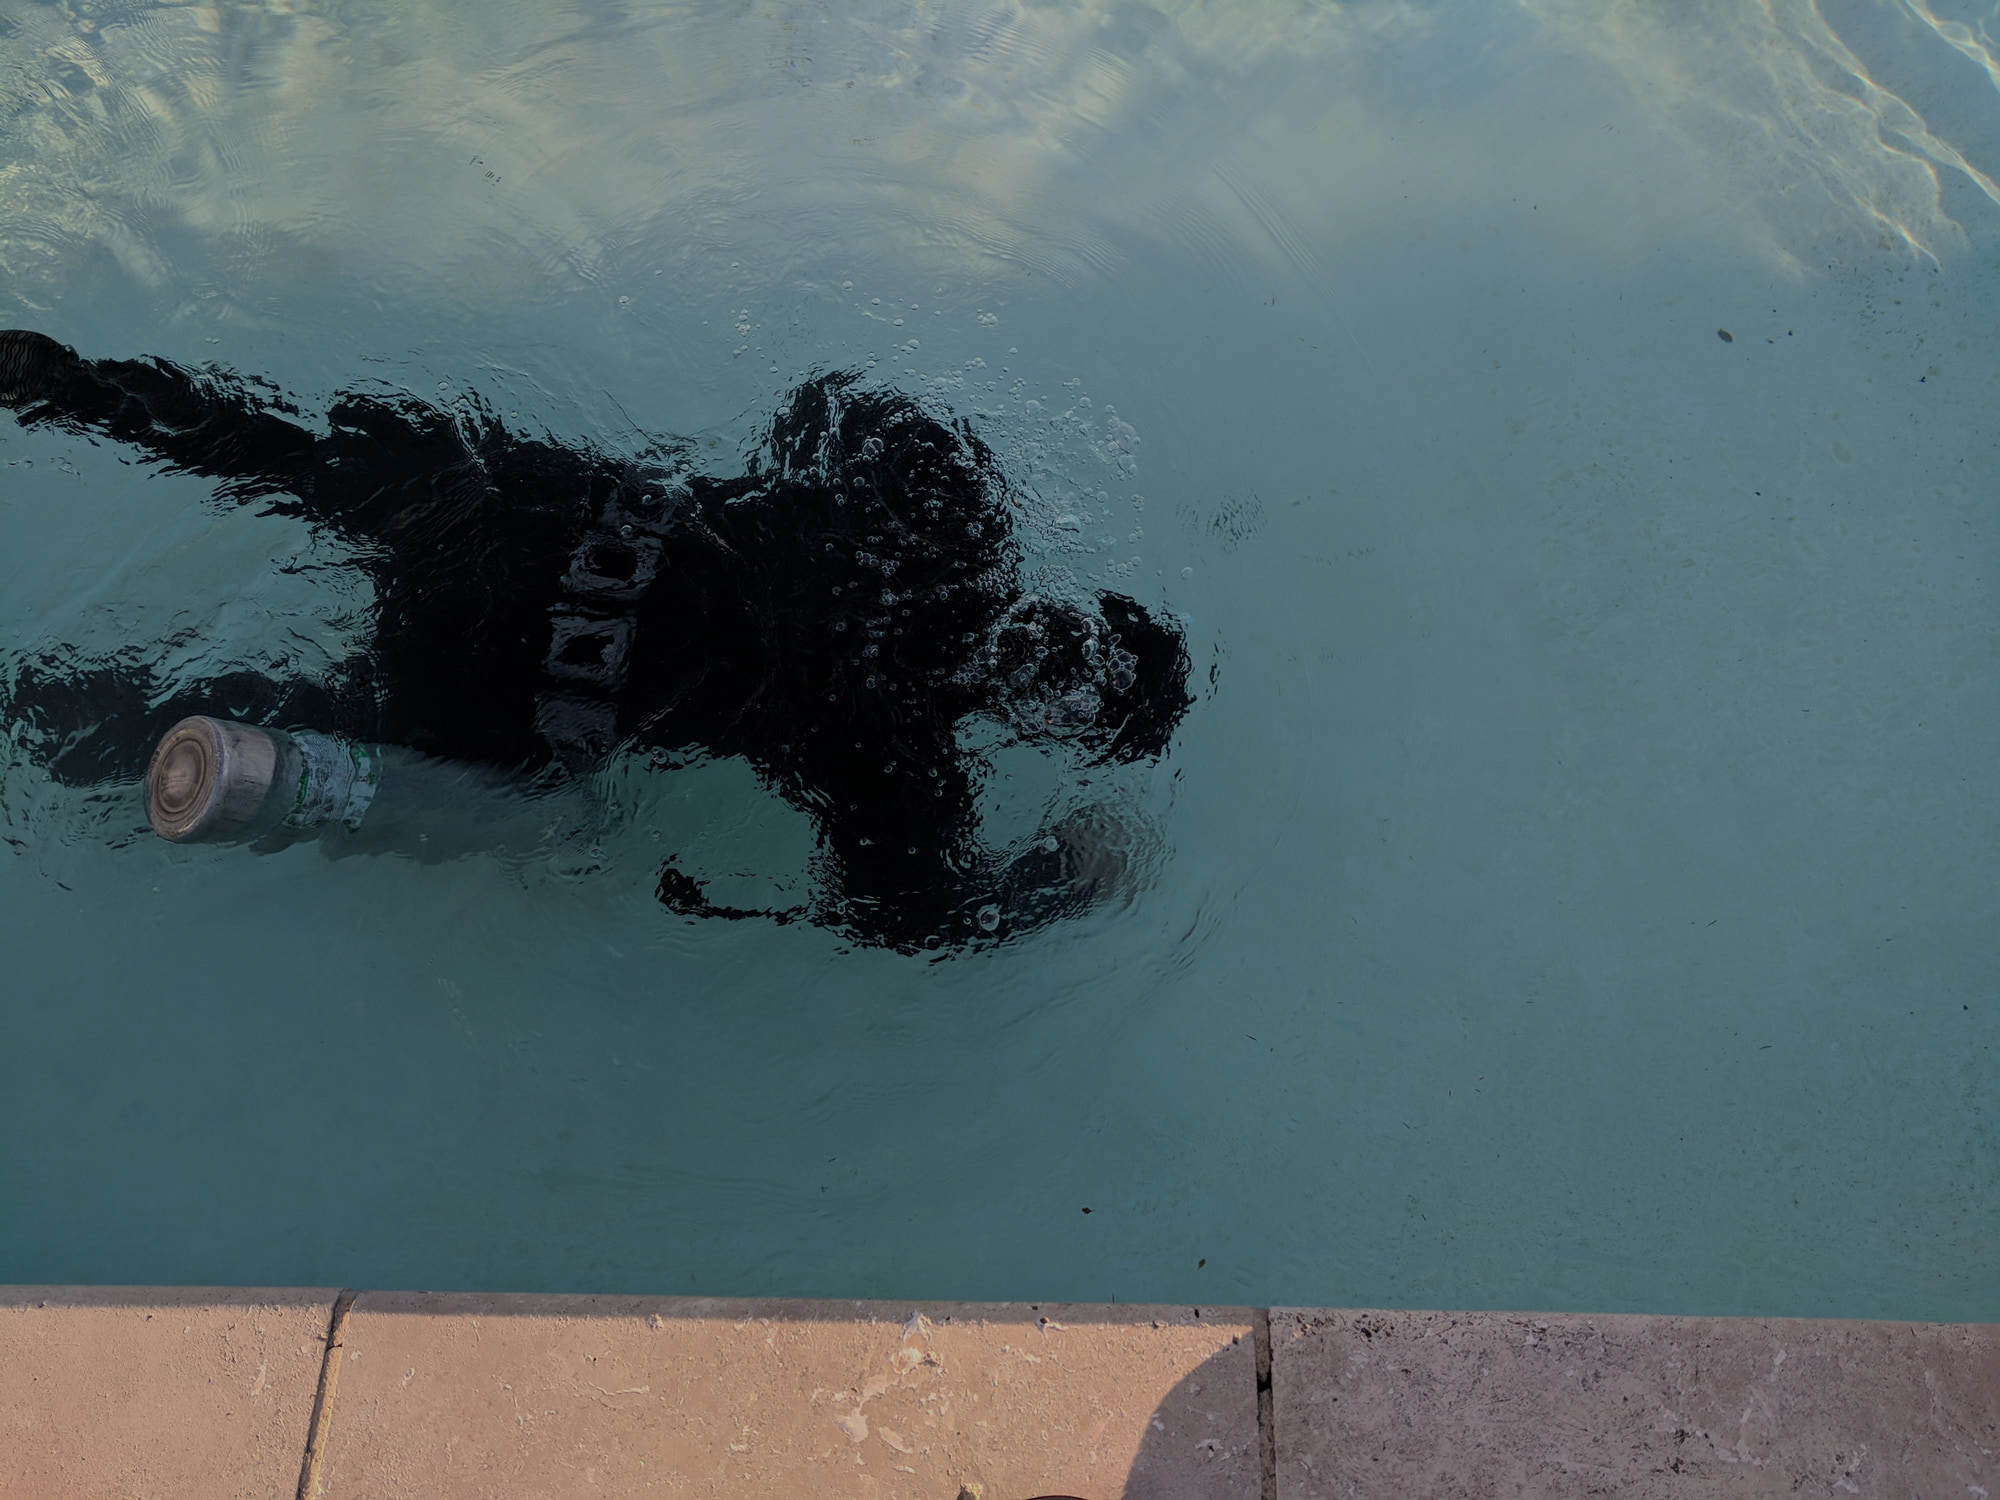 Pool Leak Services